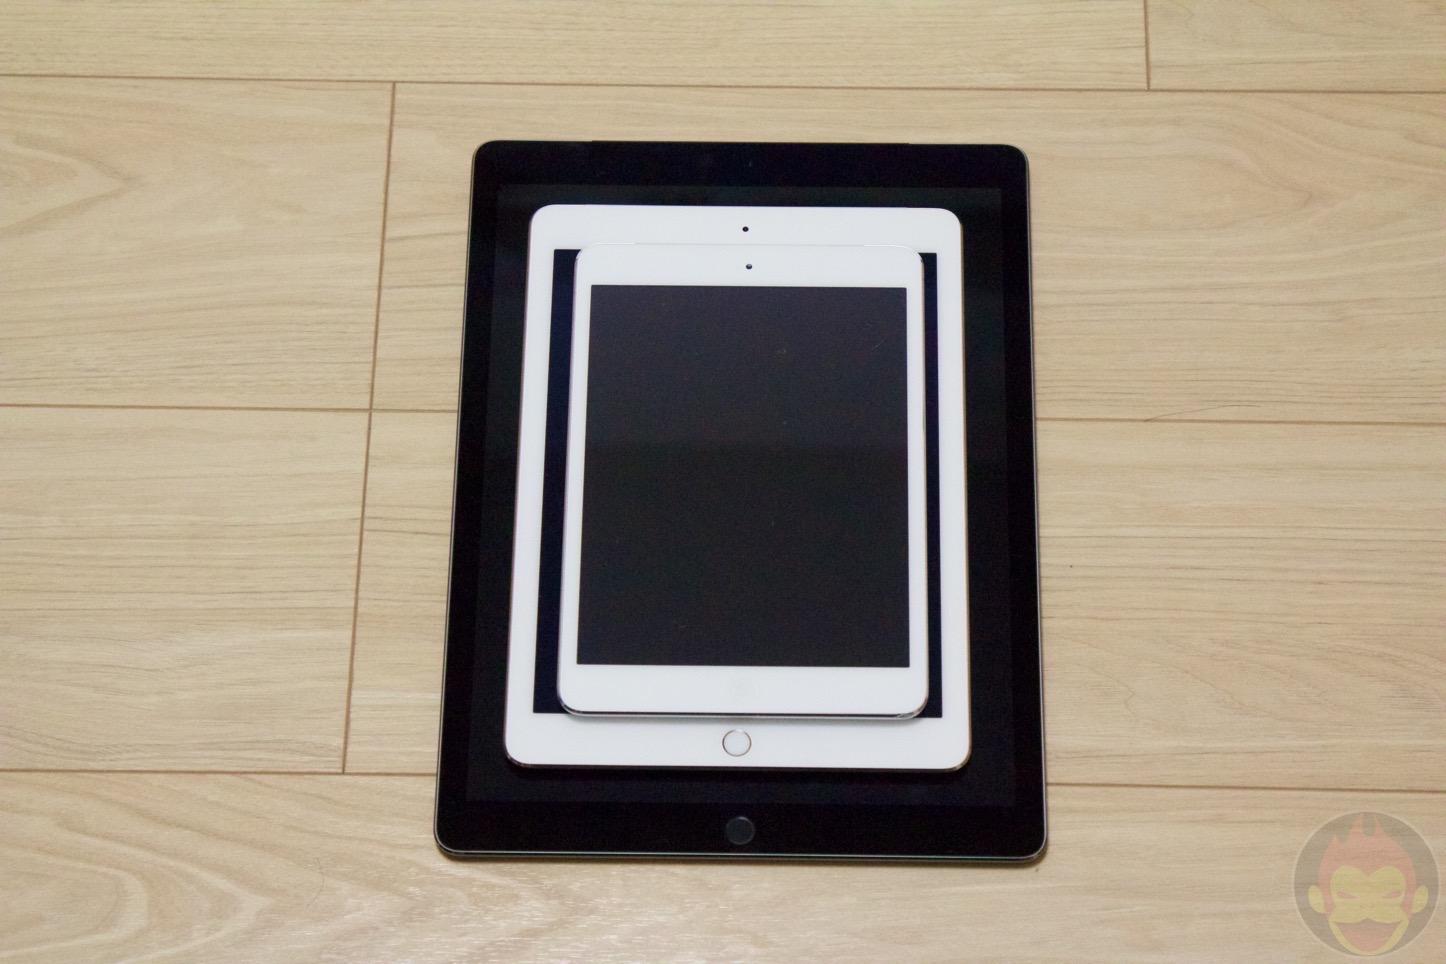 iPad-Pro-Air2-mini2-Comparison-13.jpg